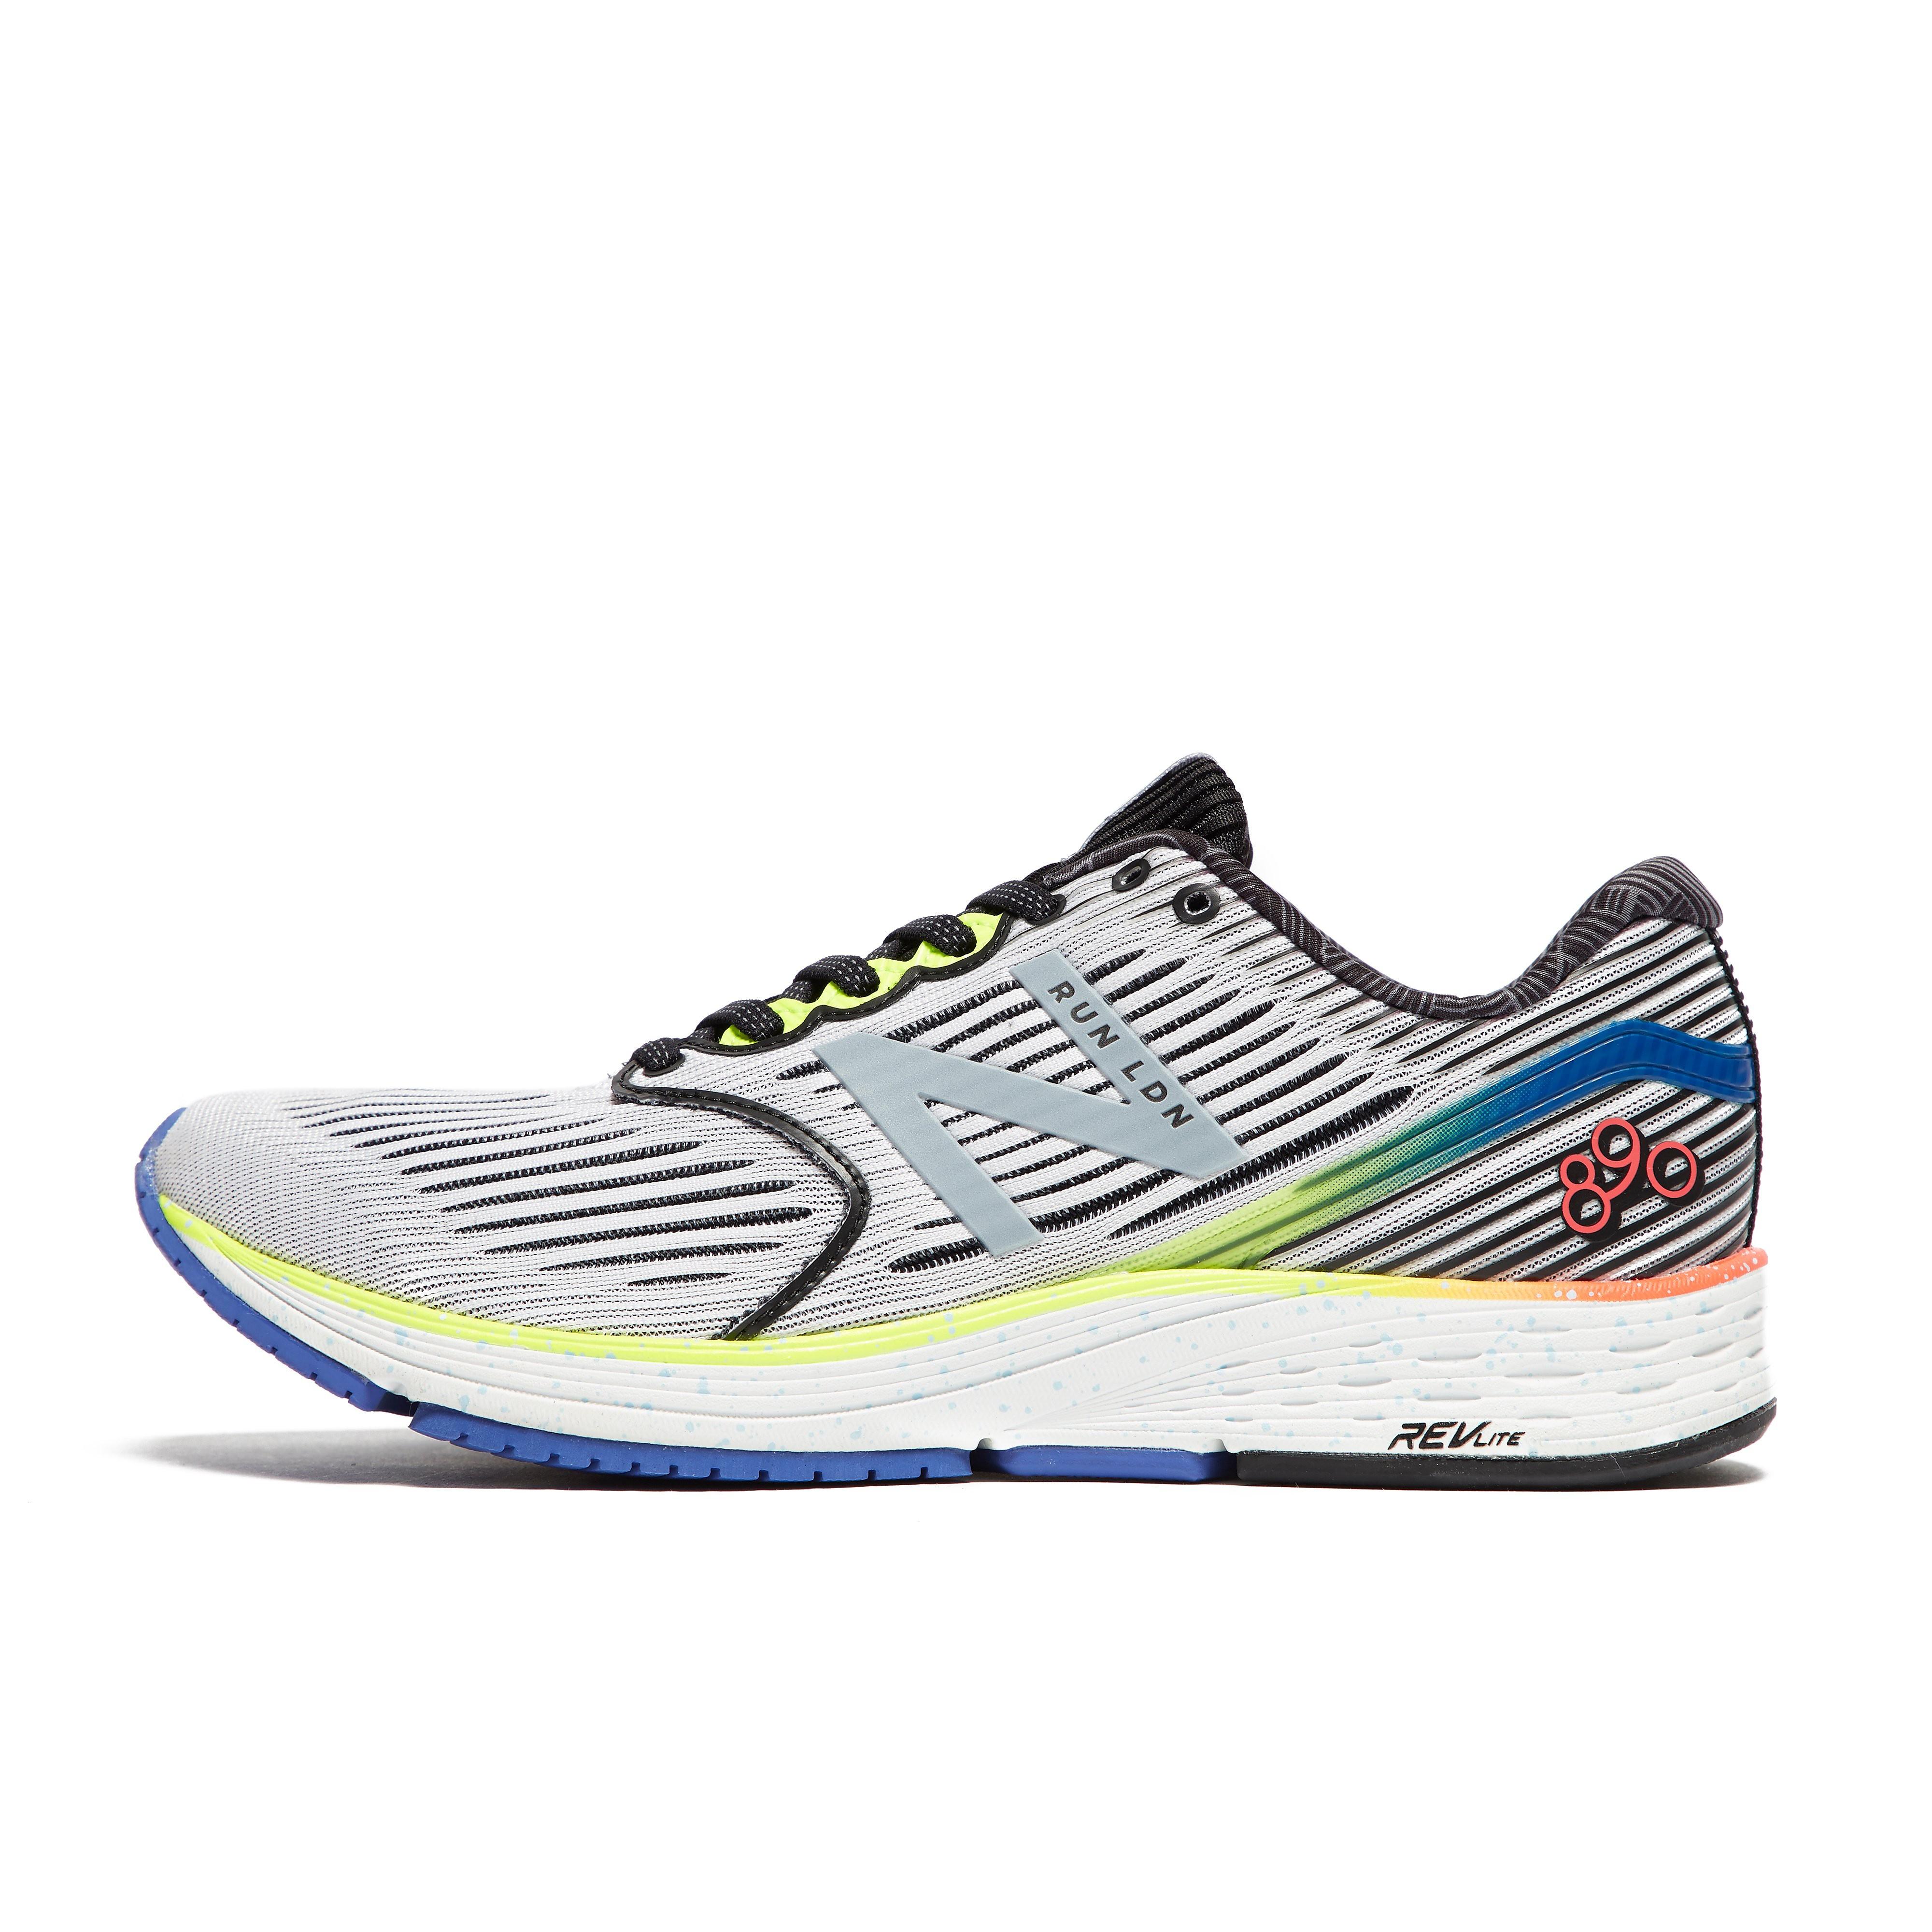 New Balance 890V6 London Marathon Edition Men's Running Shoes